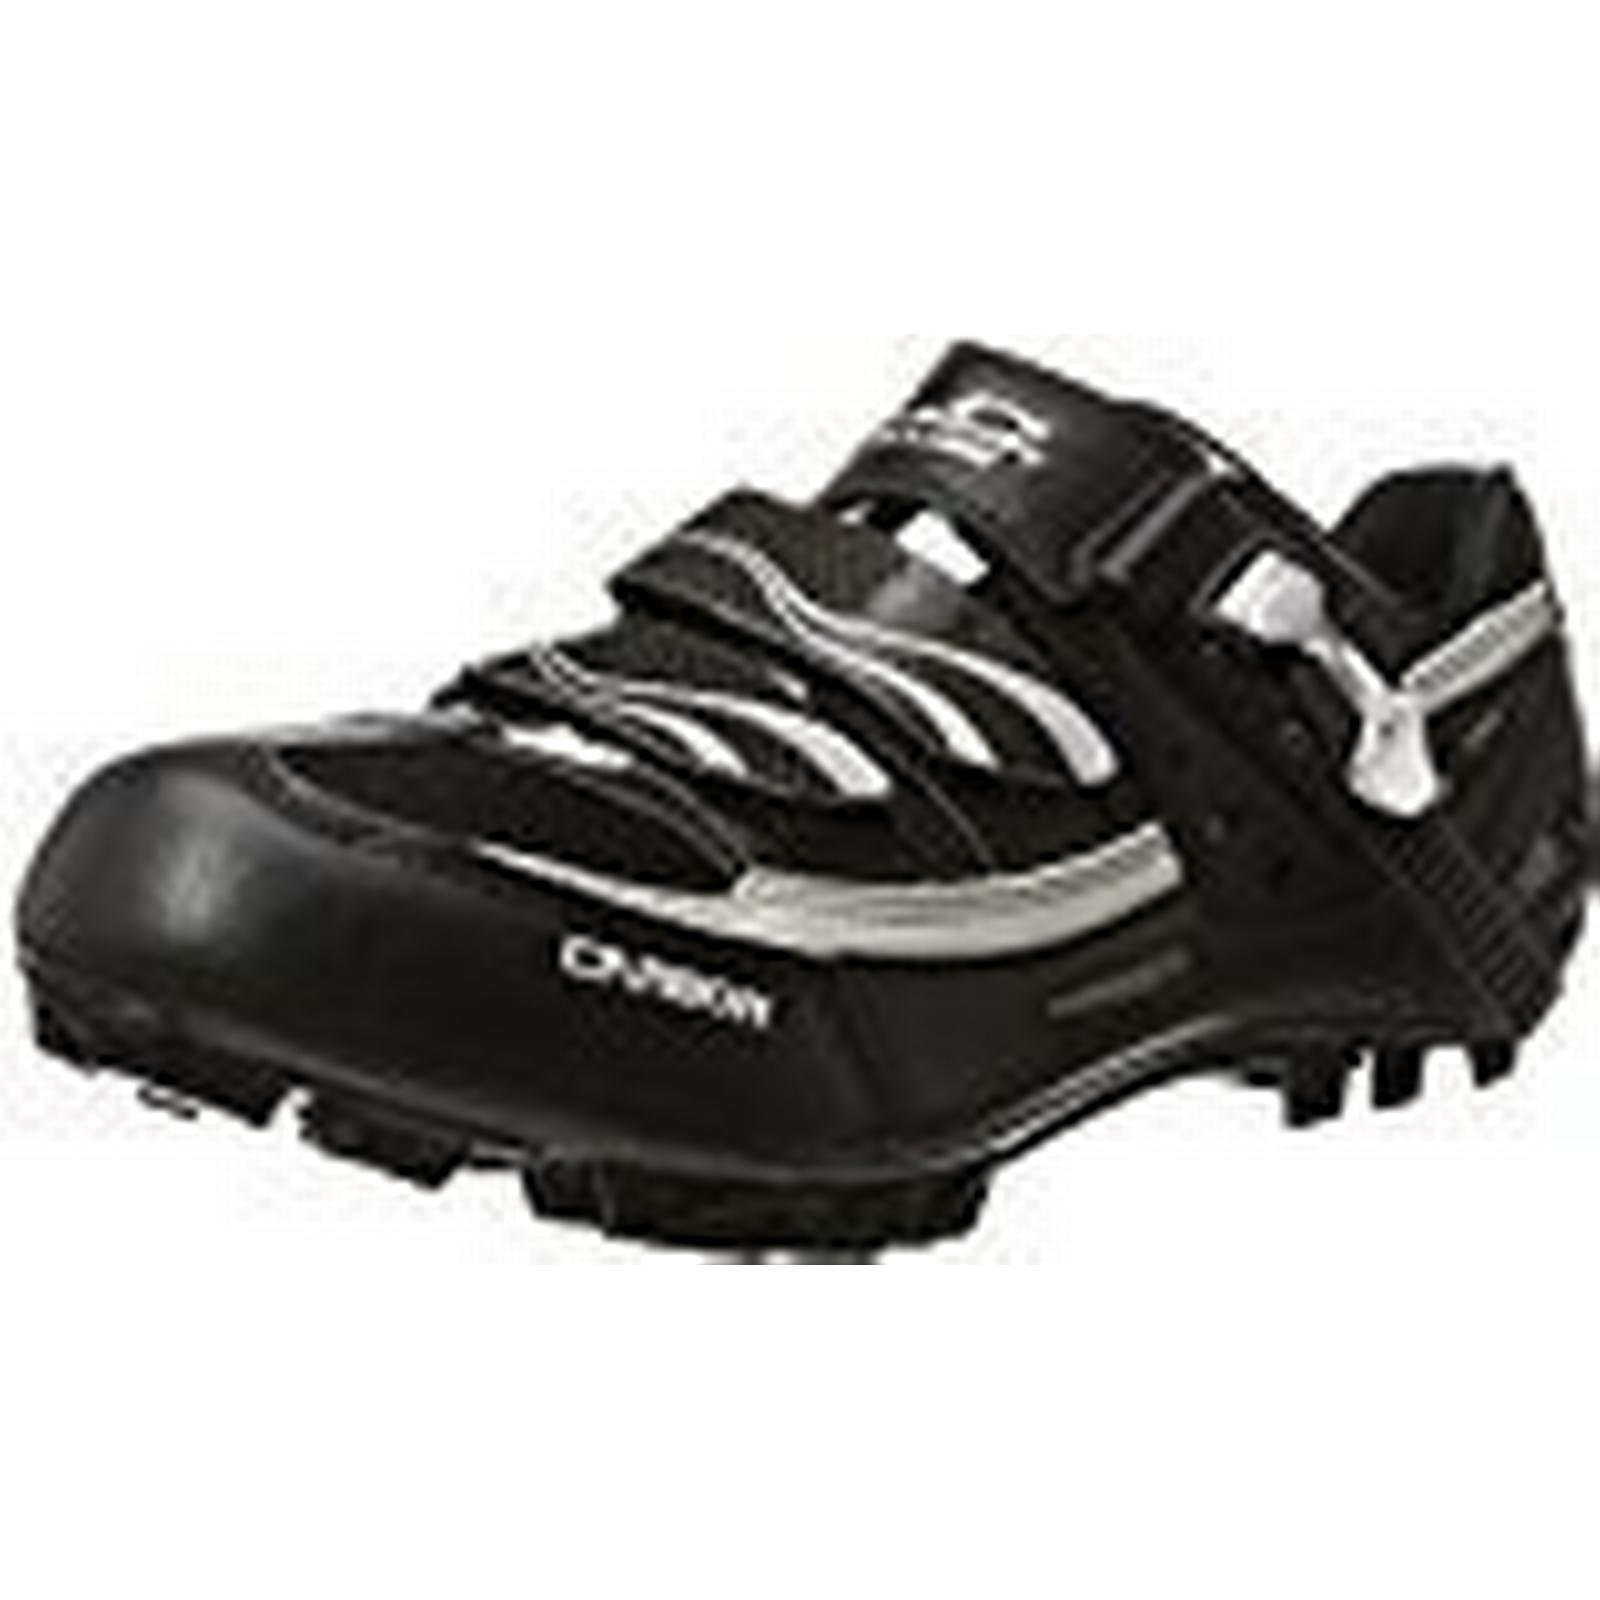 XLC Pro SL MTB M01 Shoes Adult Dirty CB M01 MTB Silver black/silver Size:41 EU (7 UK) dfb1b6